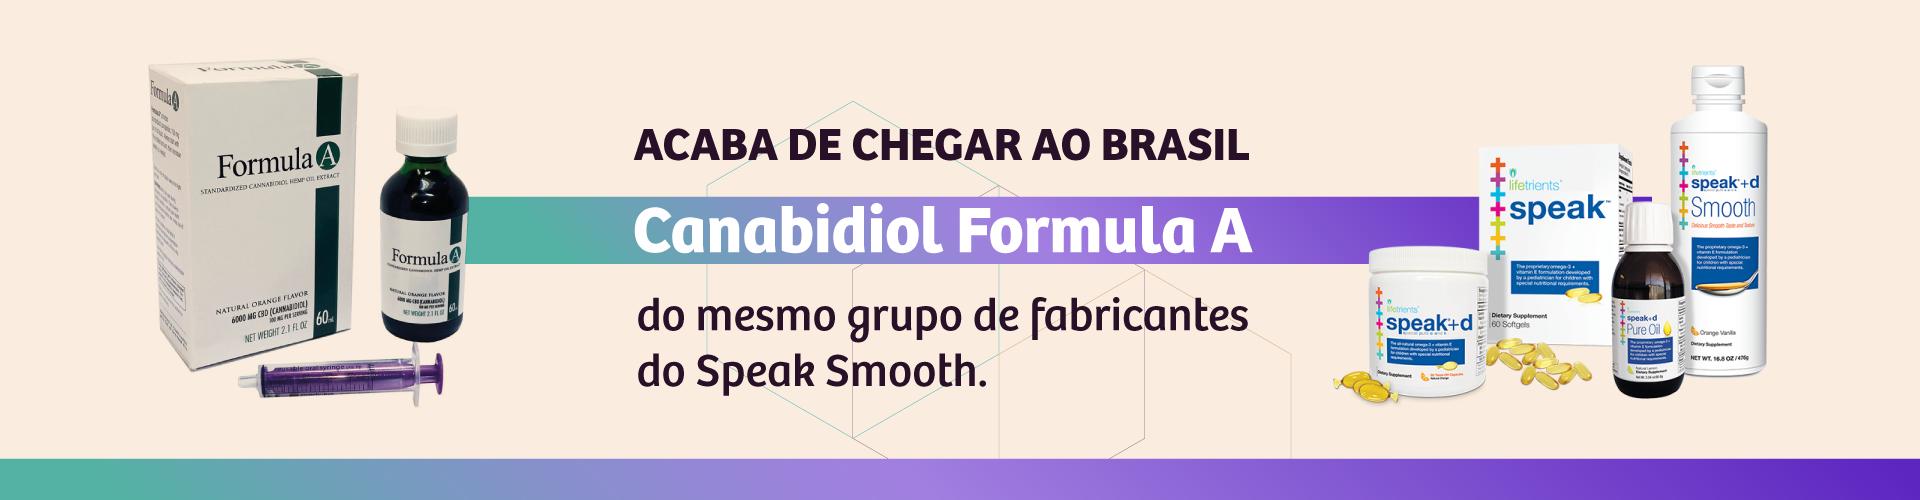 Canabidiol Formula A